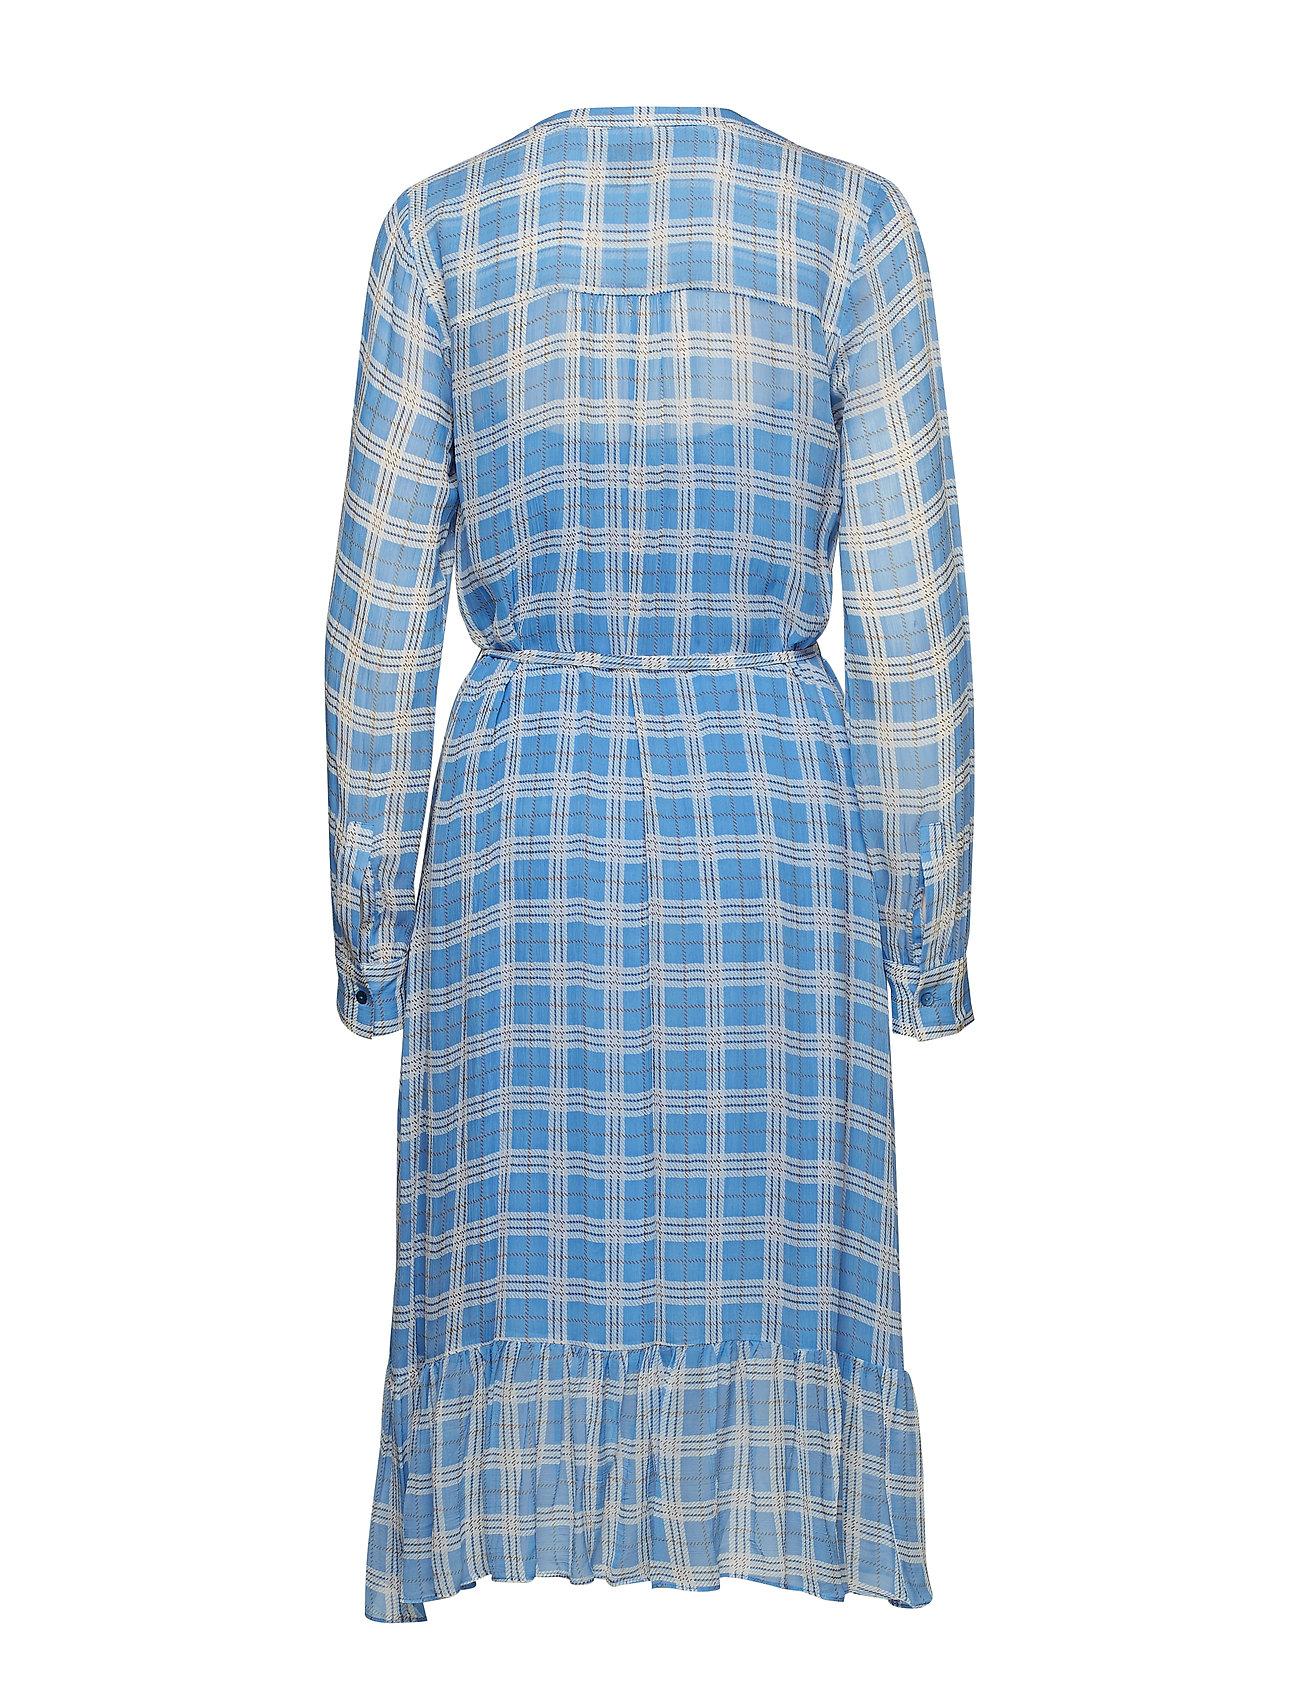 Boy Female BlueSecond Dresslittle Terna Midi EeWDYIH29